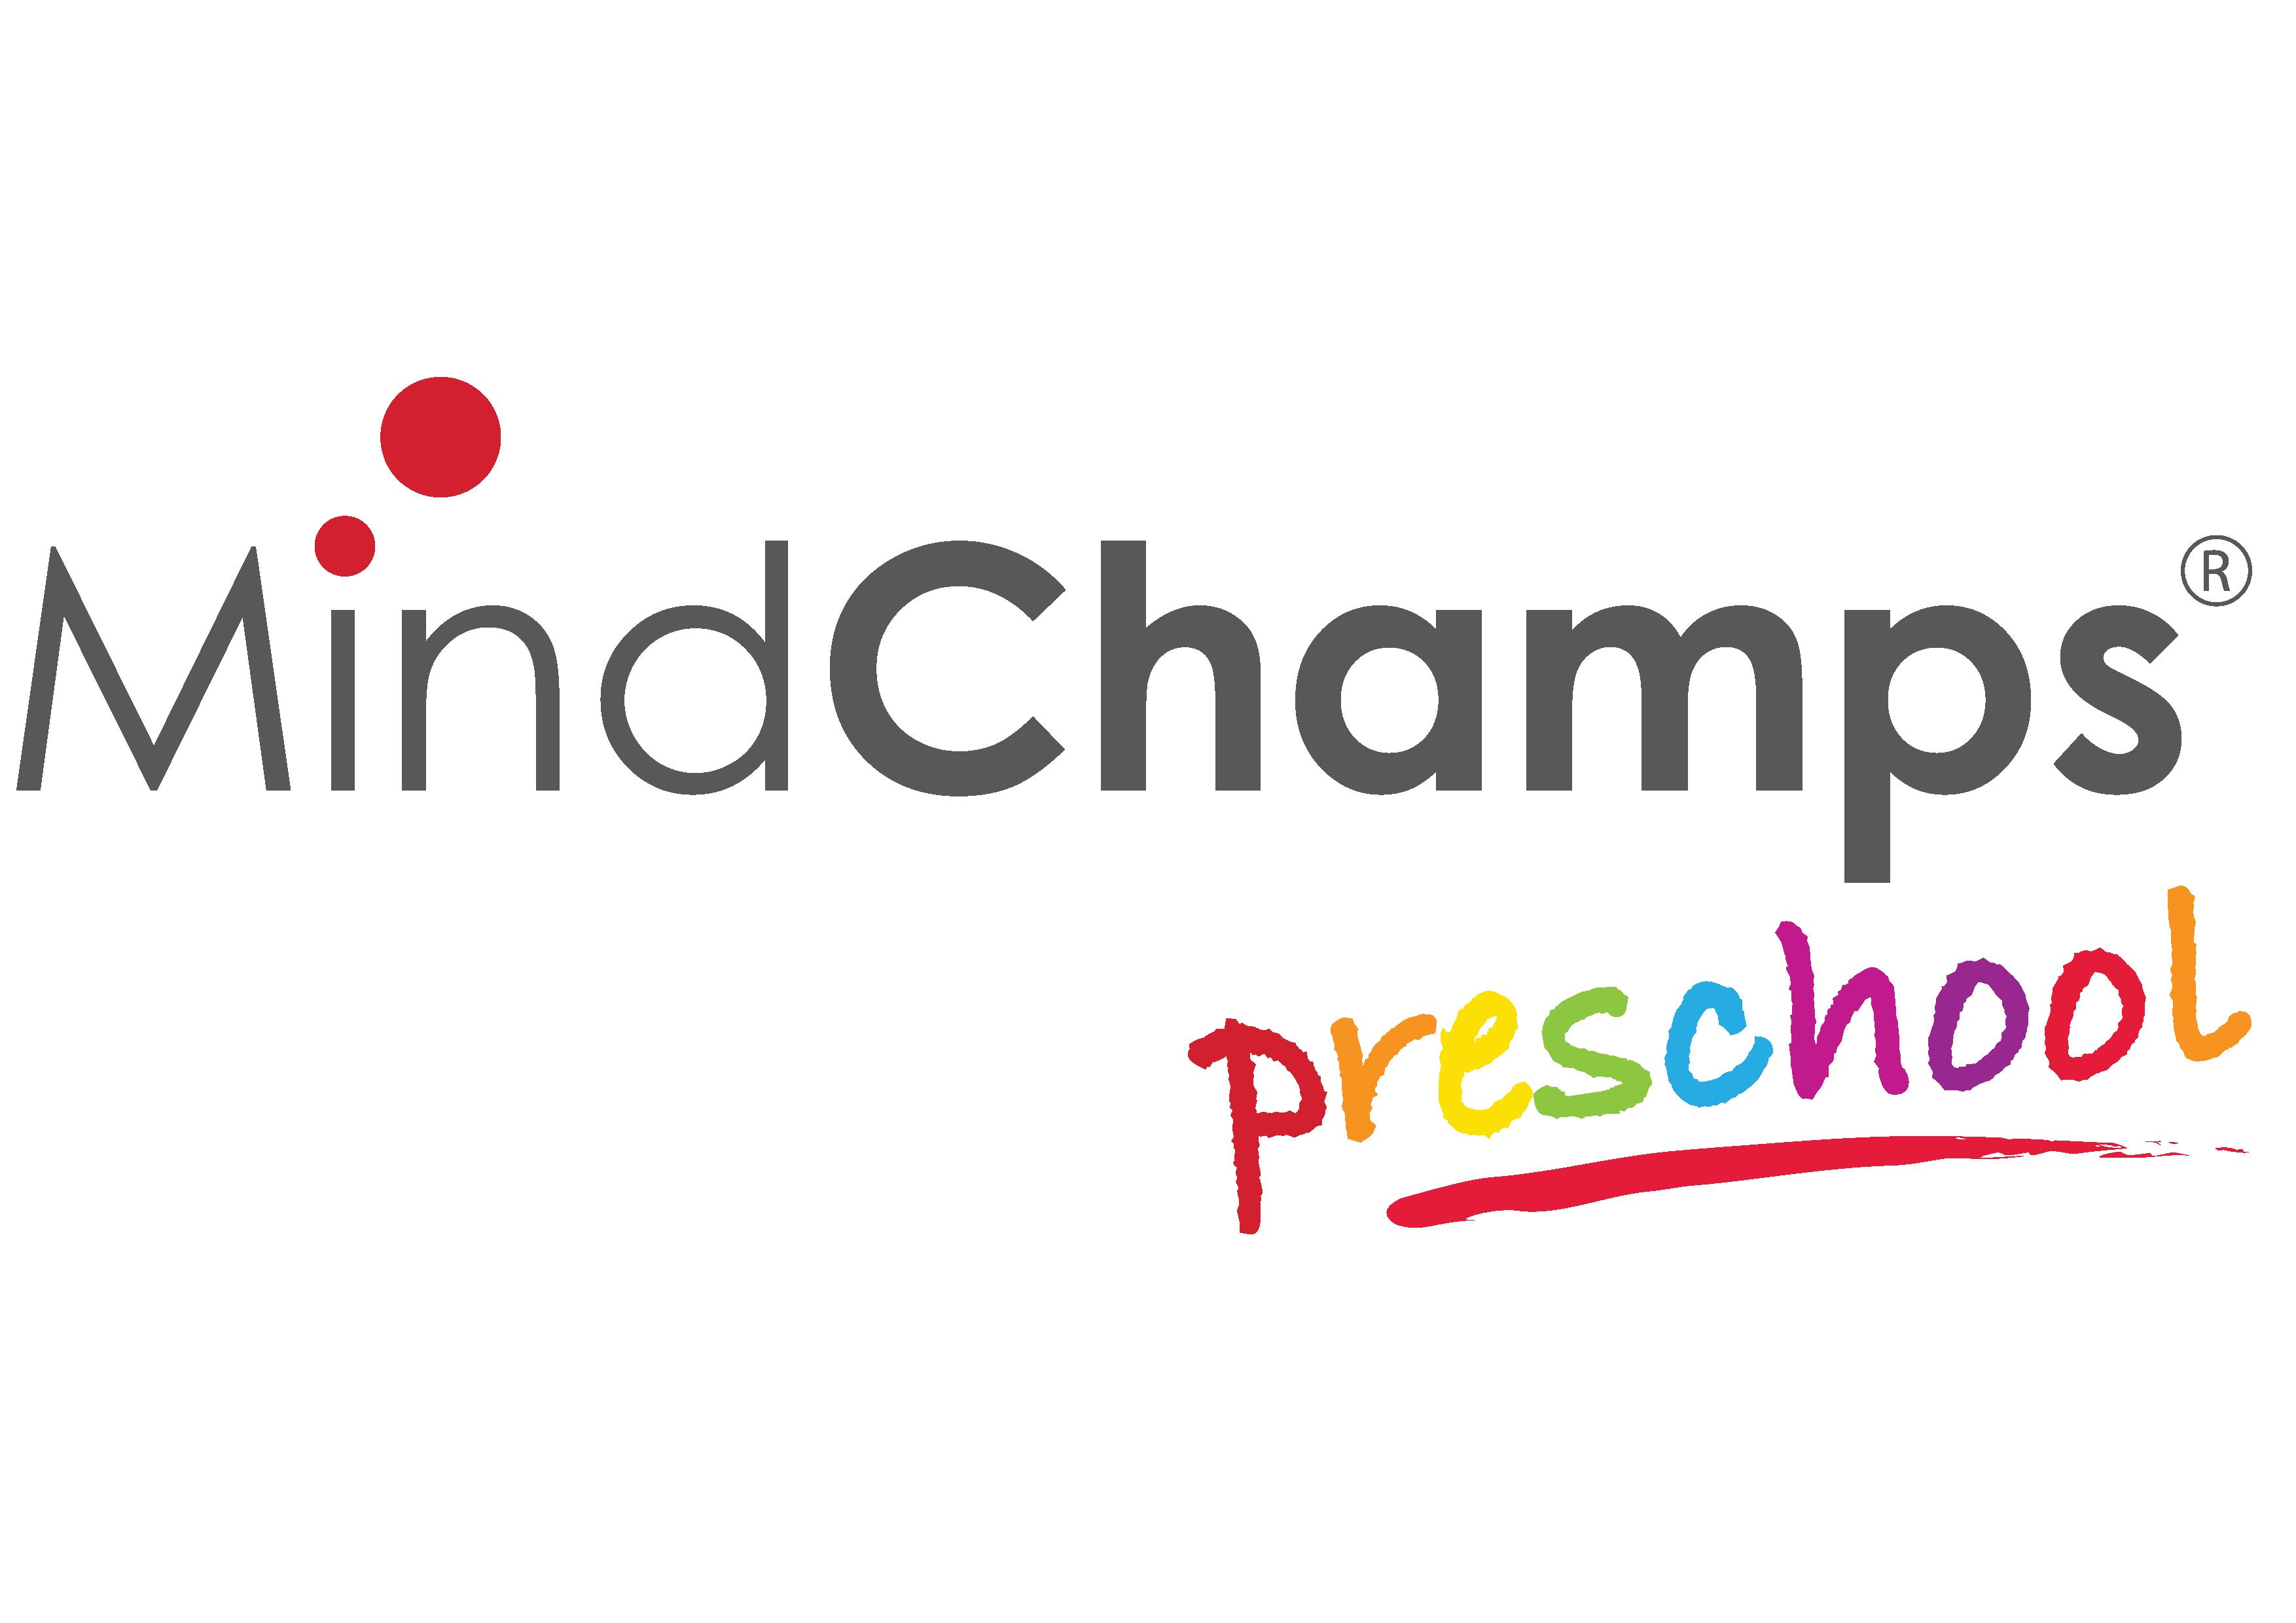 mindchamps-preschool-logo_final_high-res